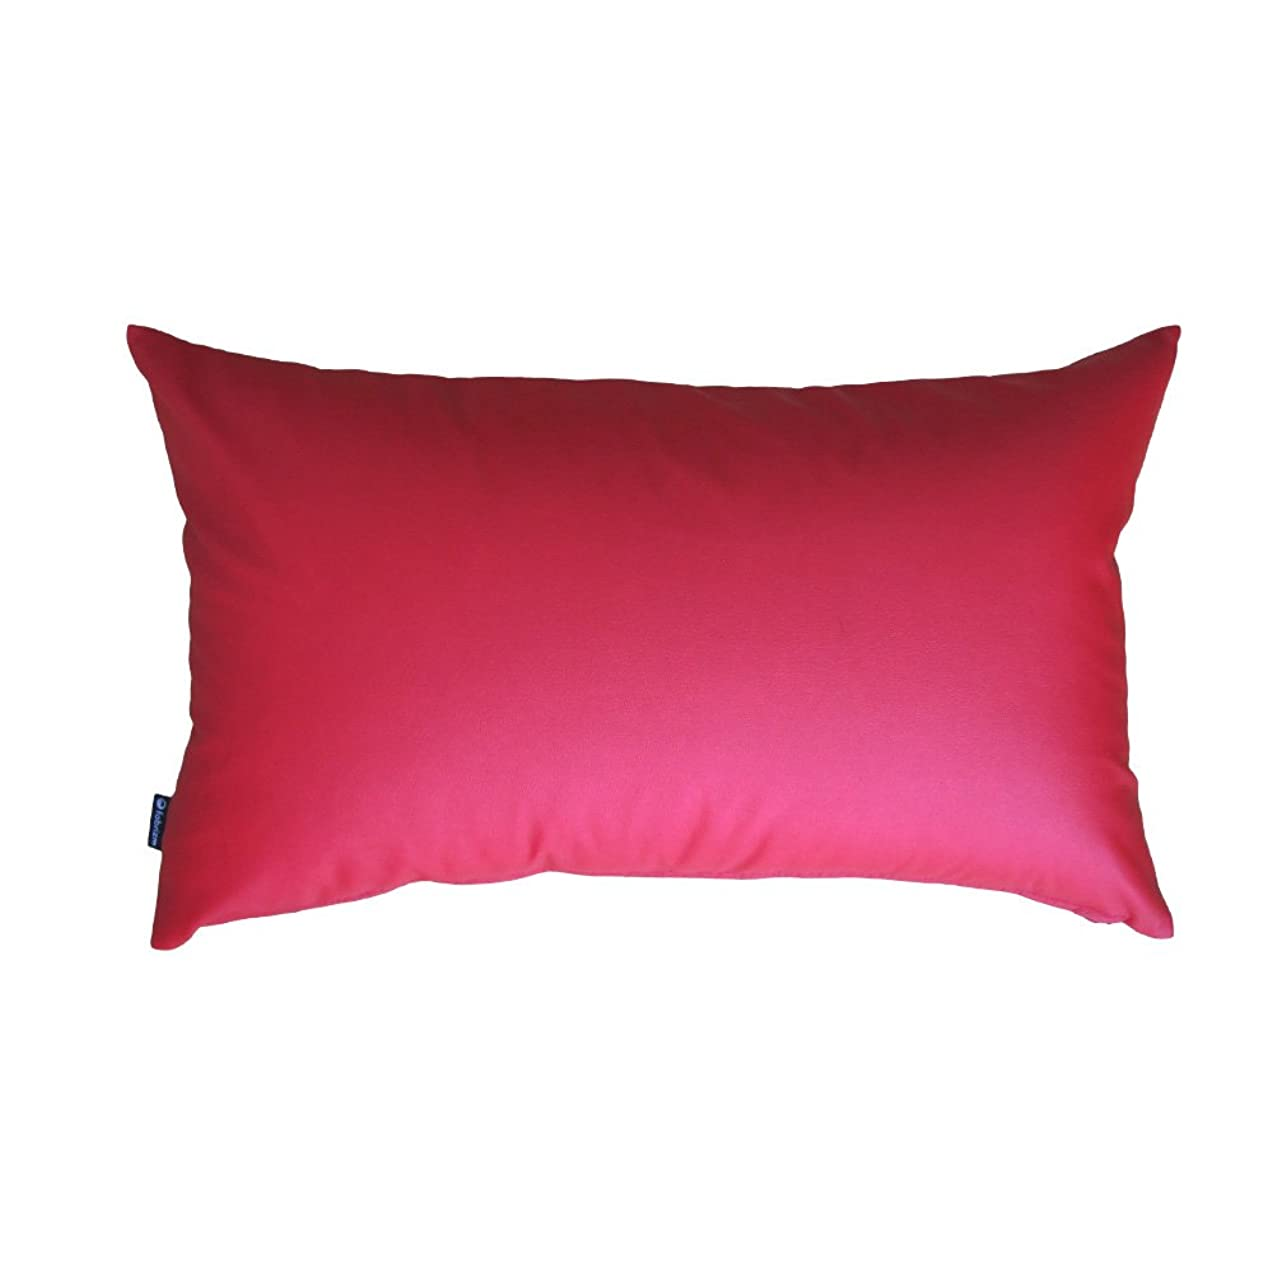 fabrizm 日本製 クッションカバー 長方形 50×30cm カラーレザー レッド 1041-red